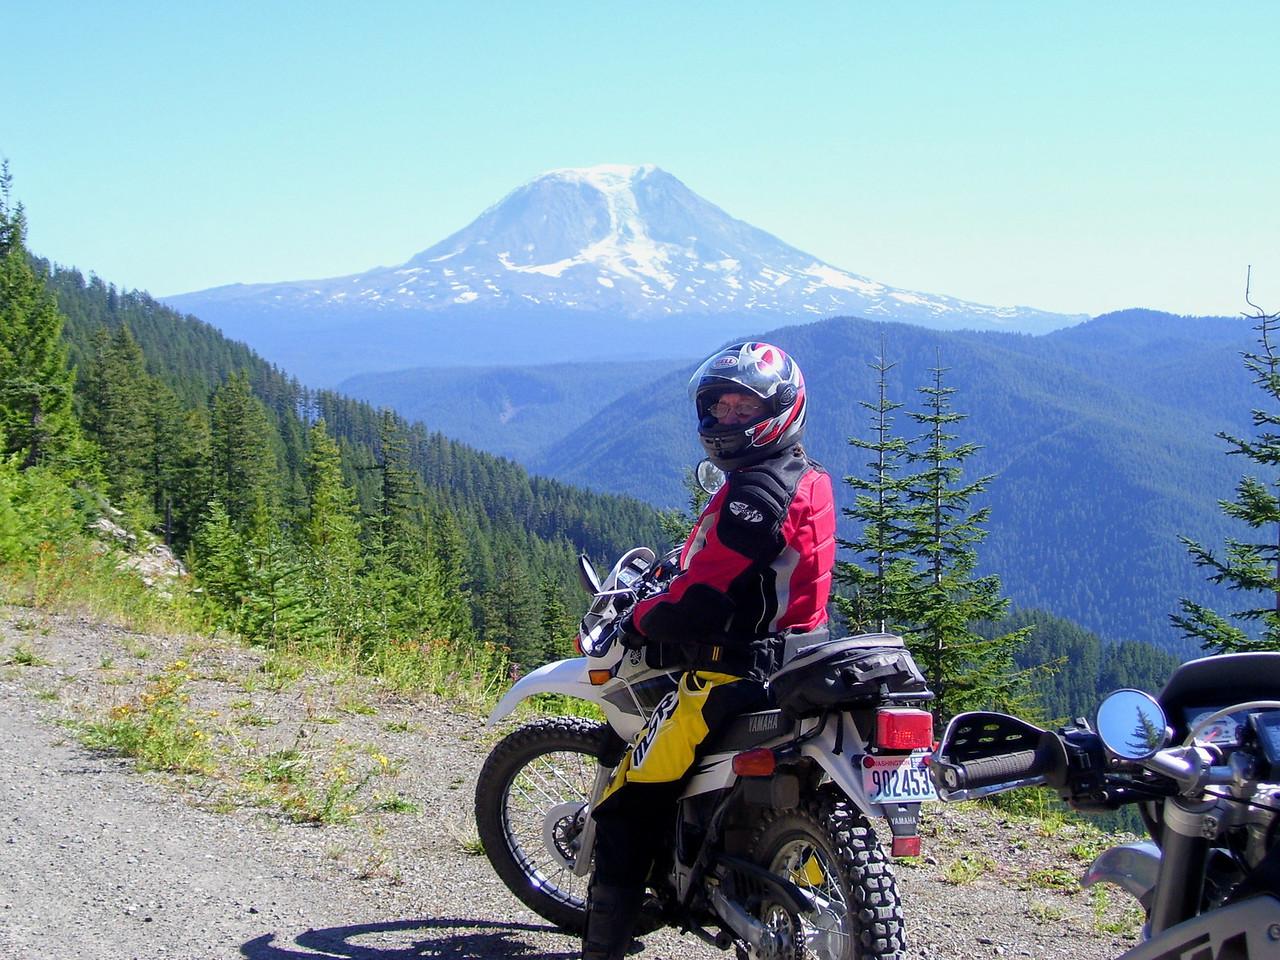 Mt. Adams from 7812